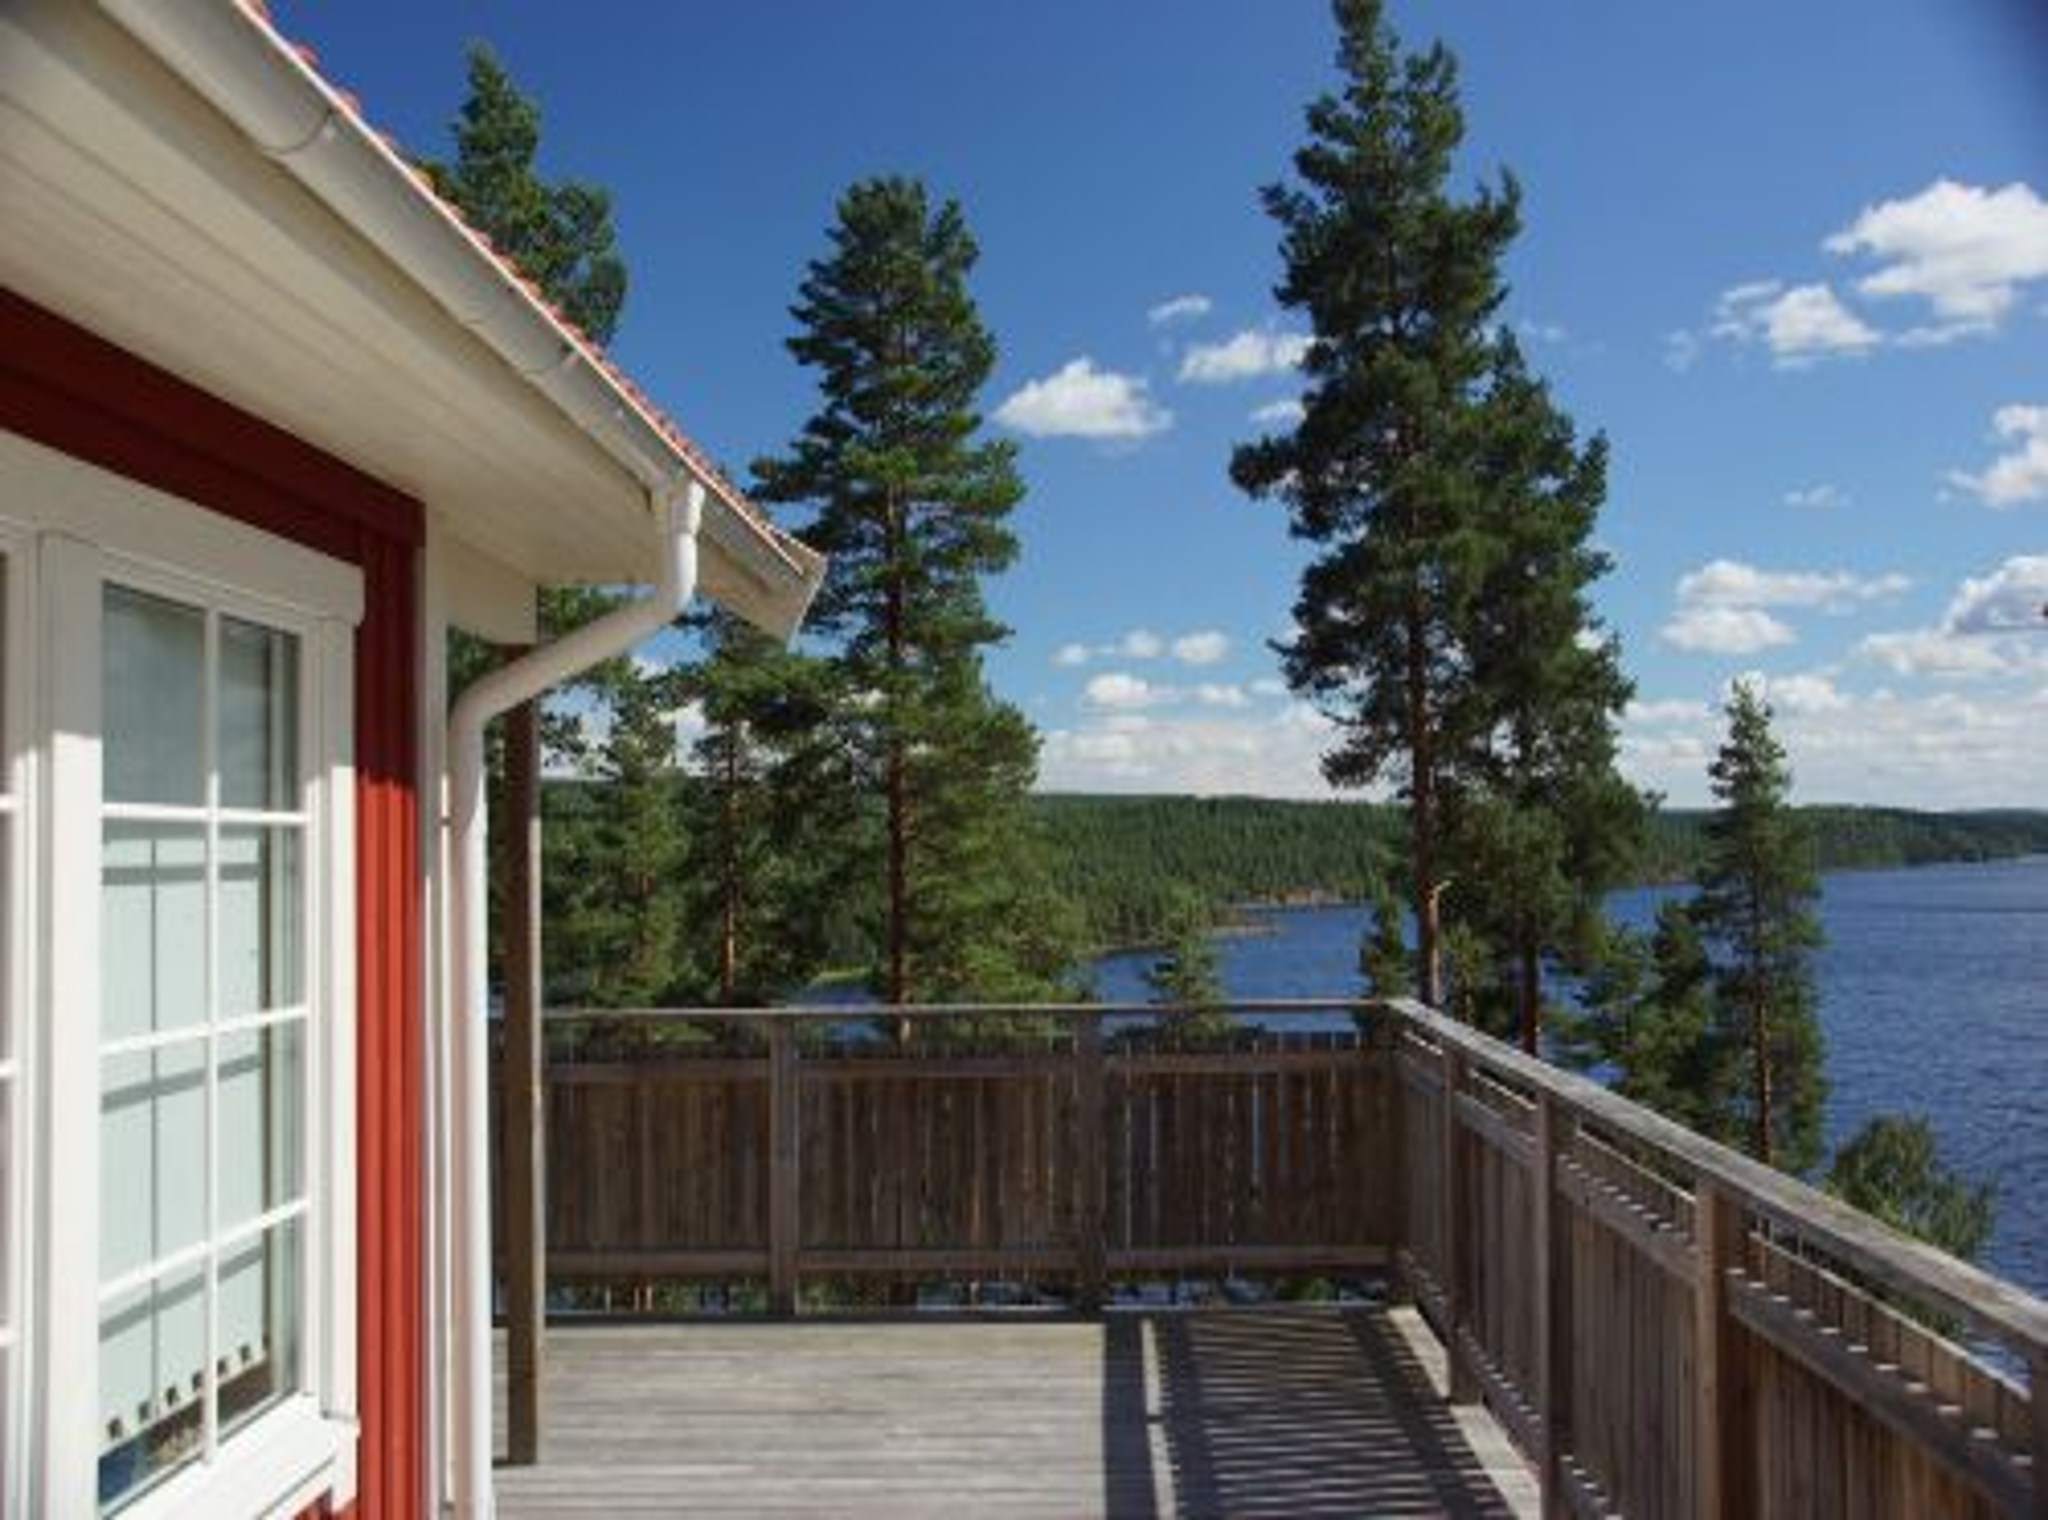 Ferienhaus-Silllal, Schweden